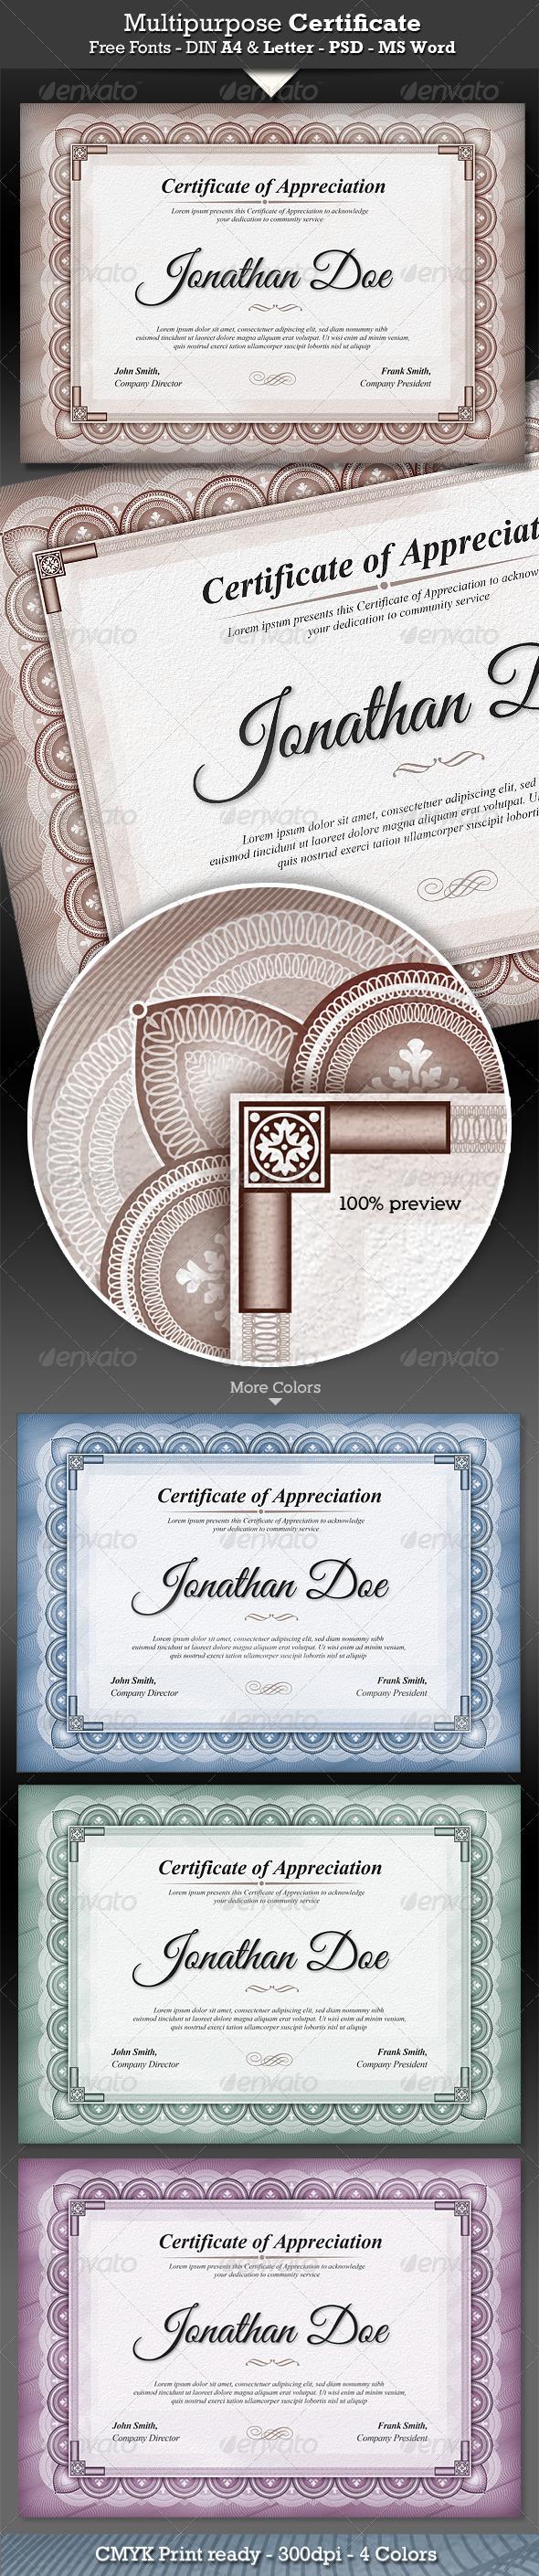 Download Multipurpose Certificates Print Design